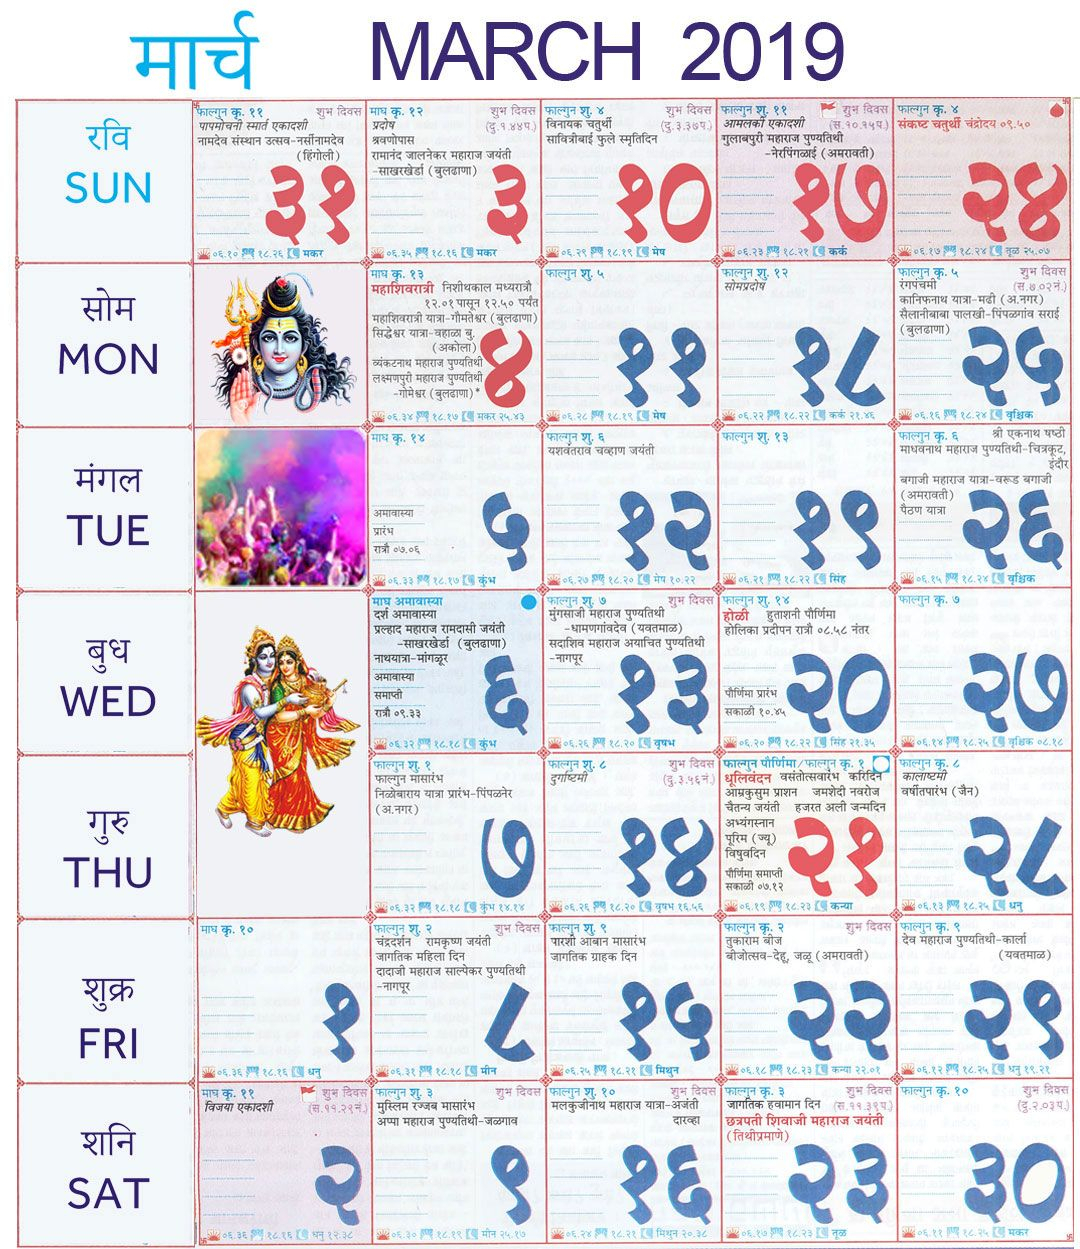 March 2019 Marathi Calendar | 2019 Calendar, Calendar March